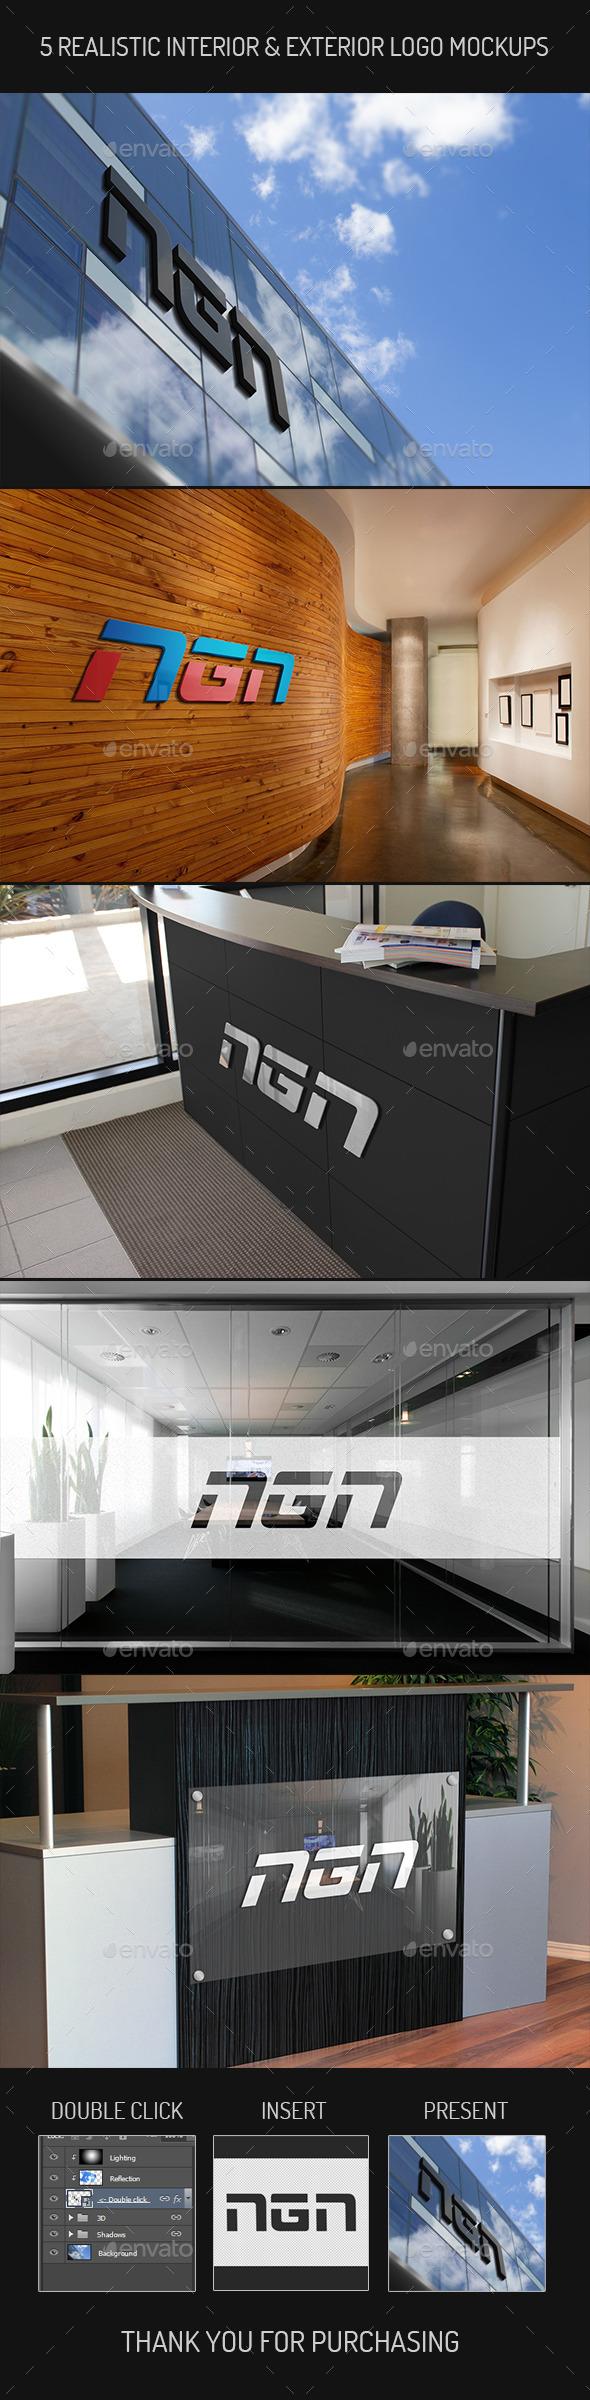 GraphicRiver 5 Realistic Interior & Exterior Logo Mock-ups 10766557